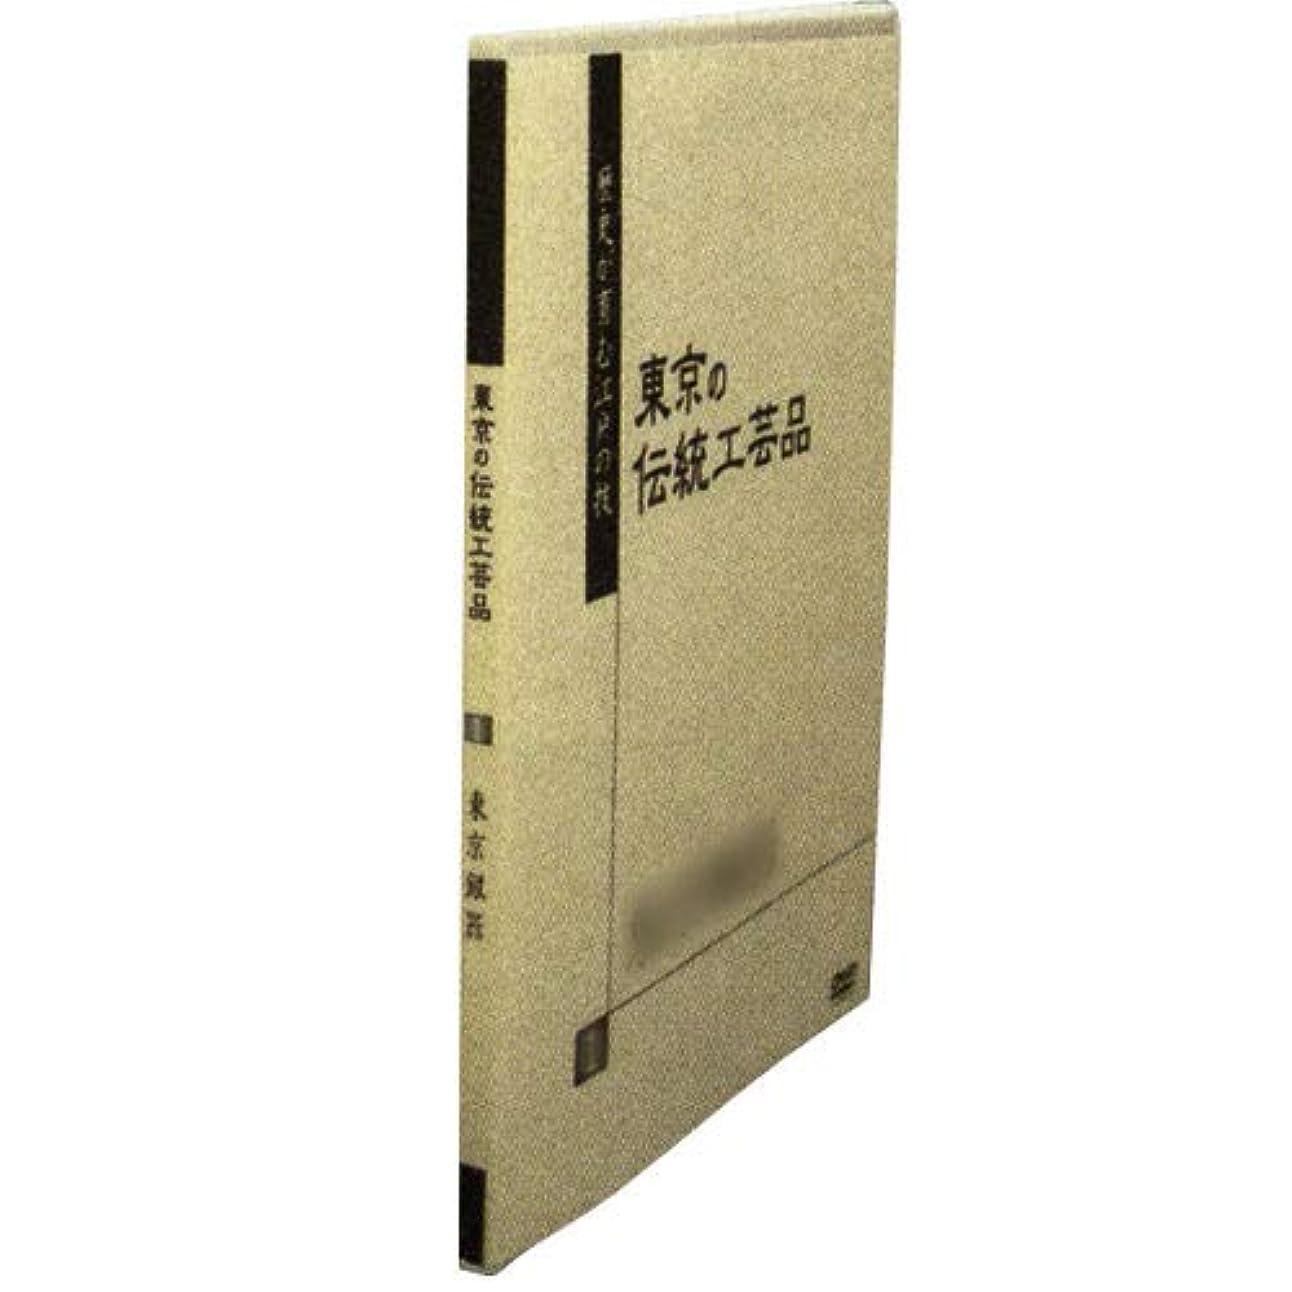 突っ込む落花生付属品DVD 27.東京彫金 B53-3727